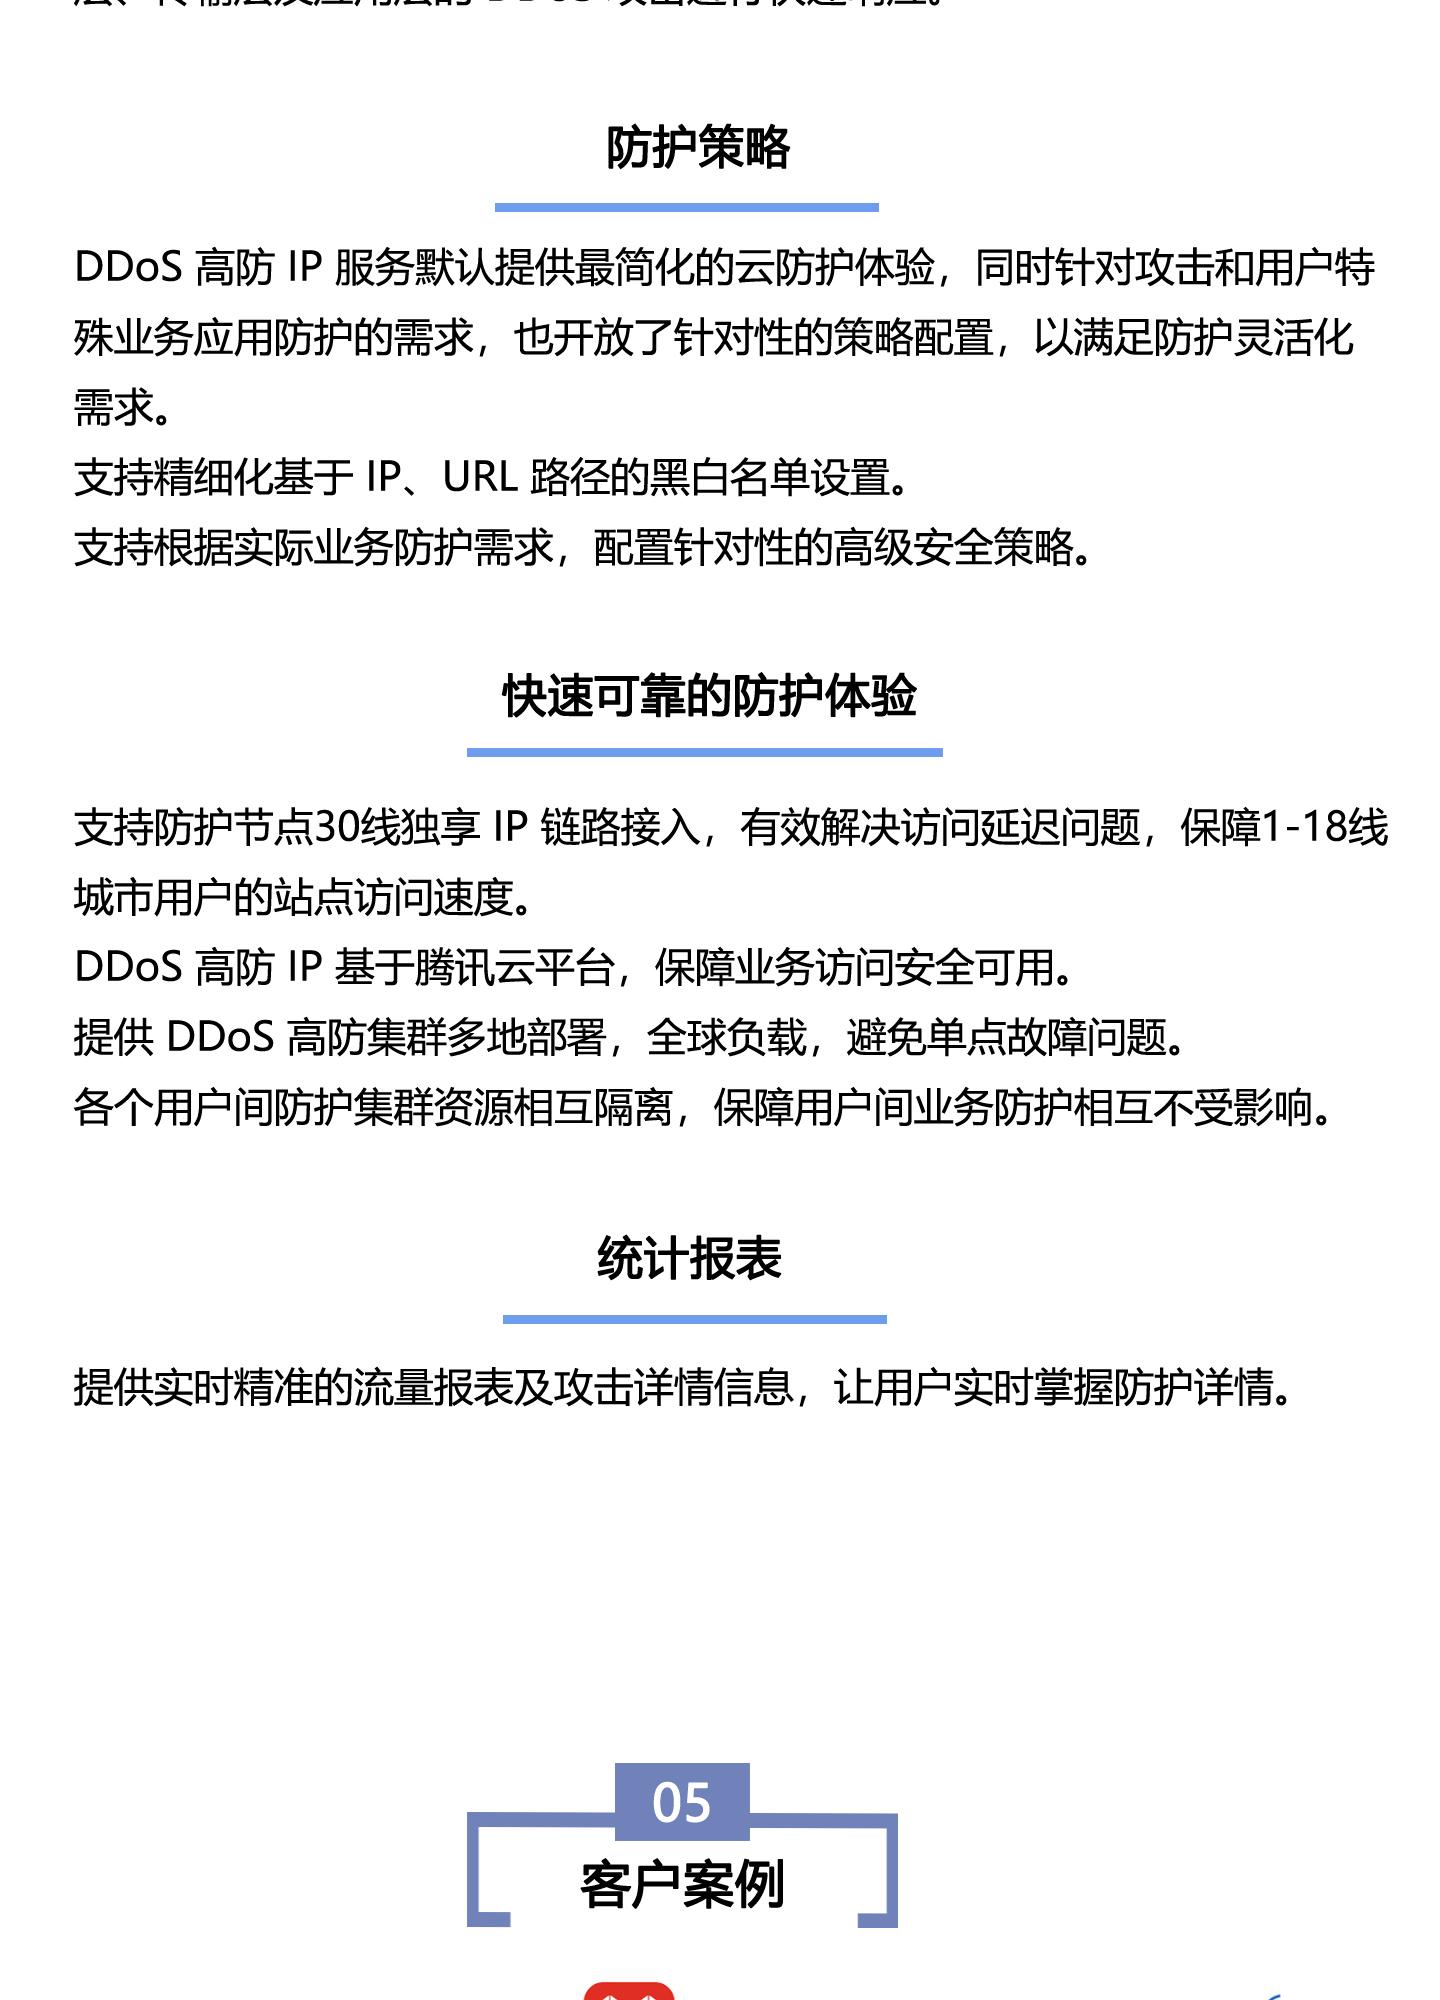 T-Sec-DDoS-高防-IP1440_06.jpg